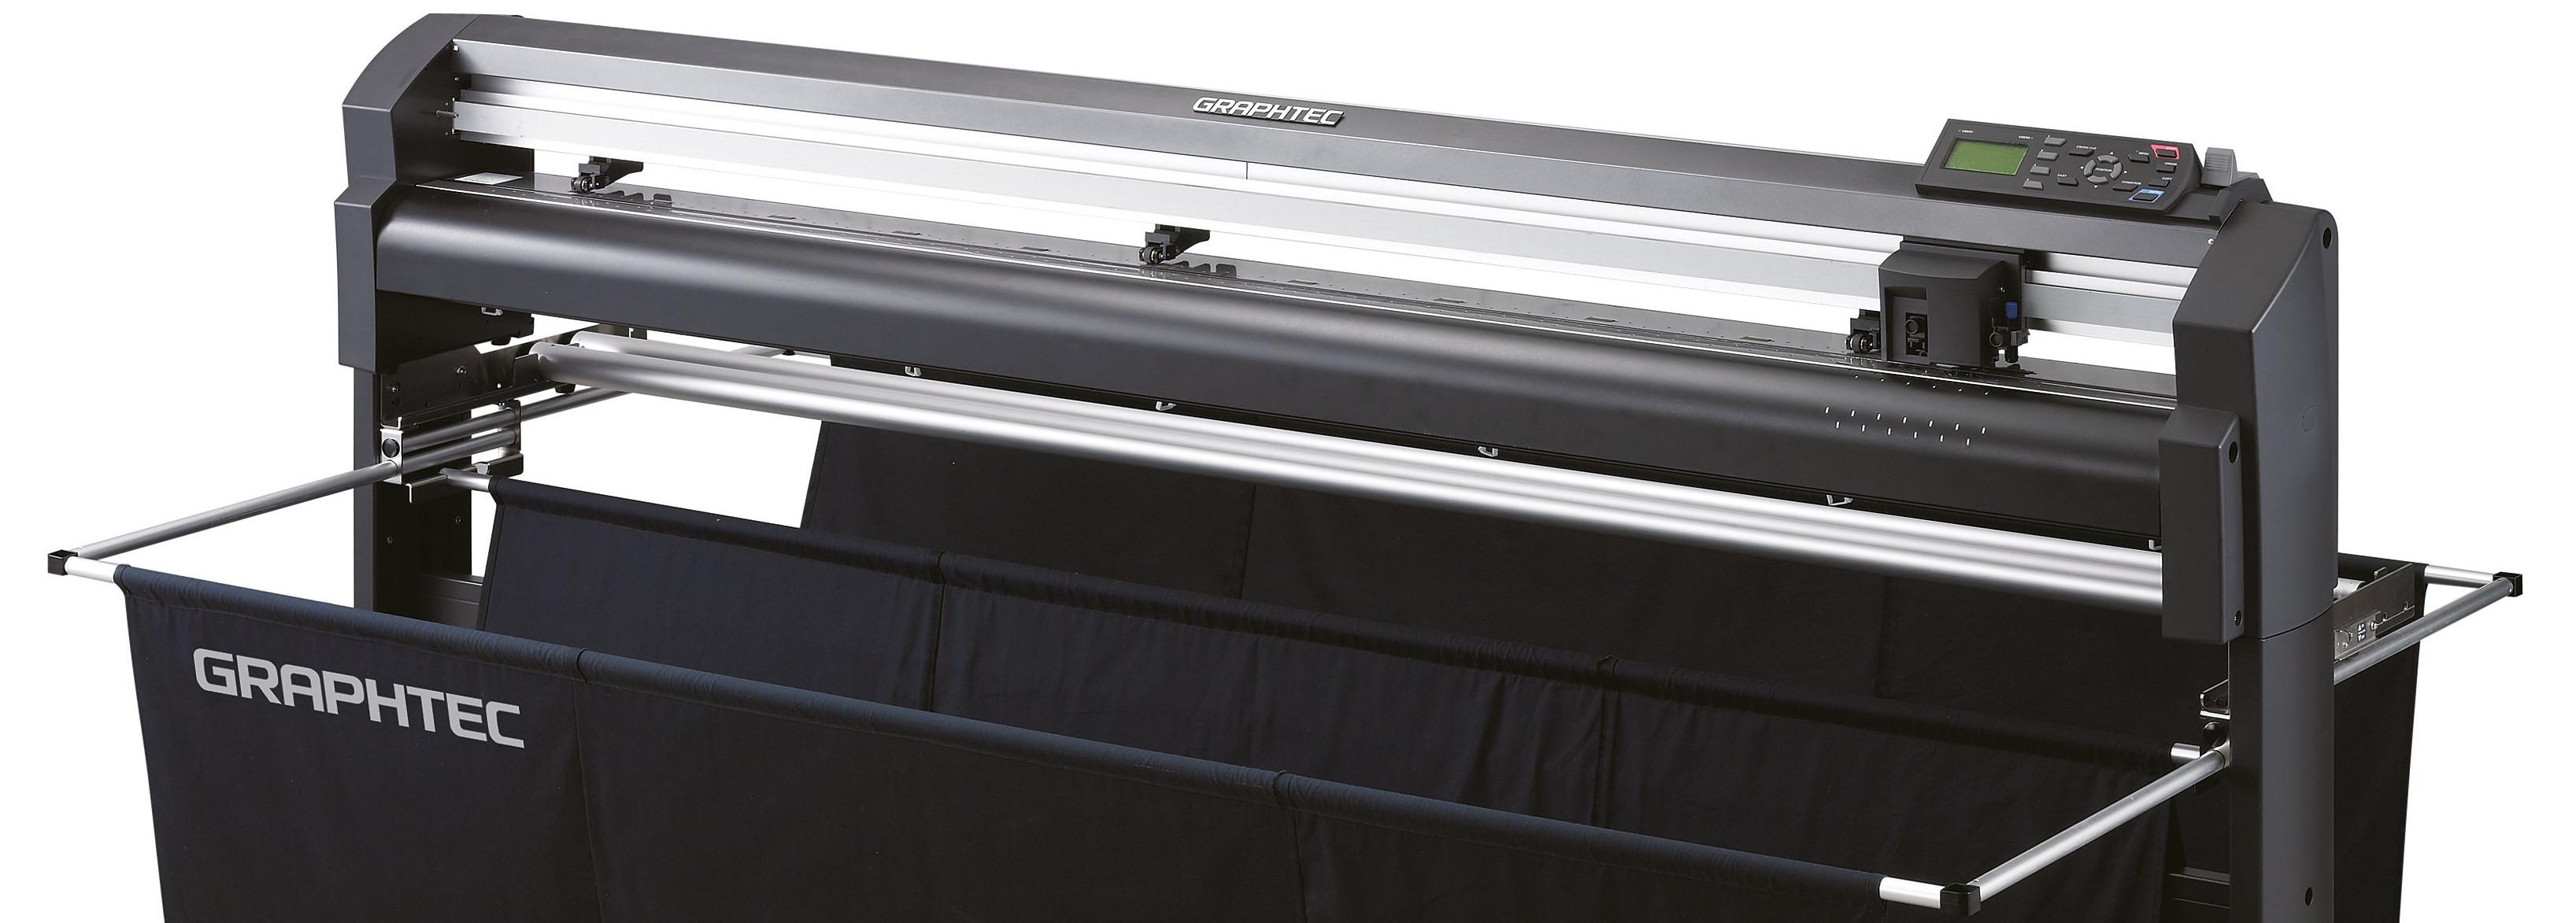 FC8600-160 rolkowy ploter tnący